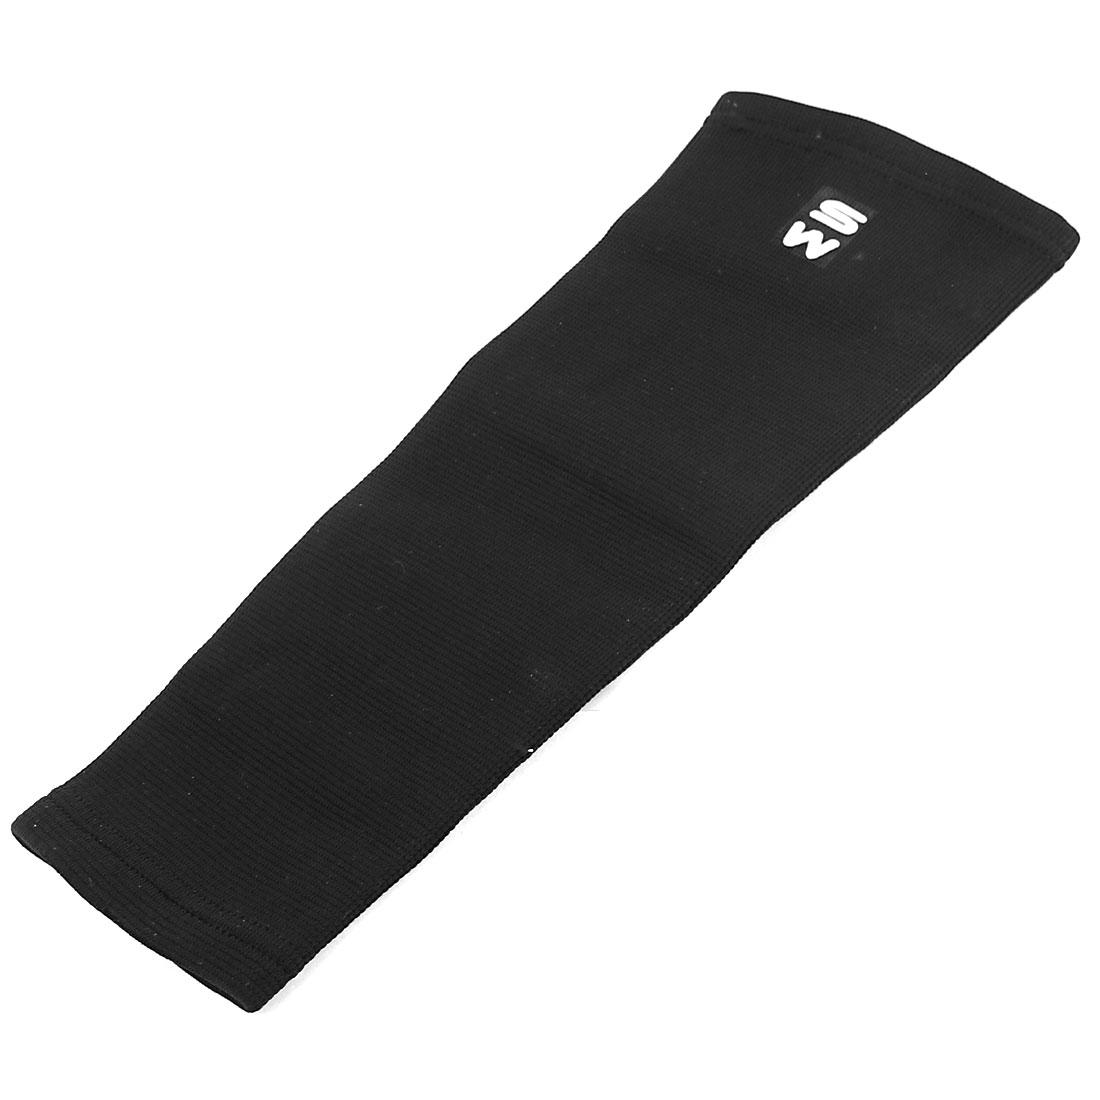 Nylon Latex Silk Elastic Leg Muscle Support Sports Protector Sleeve Knee Brace Black